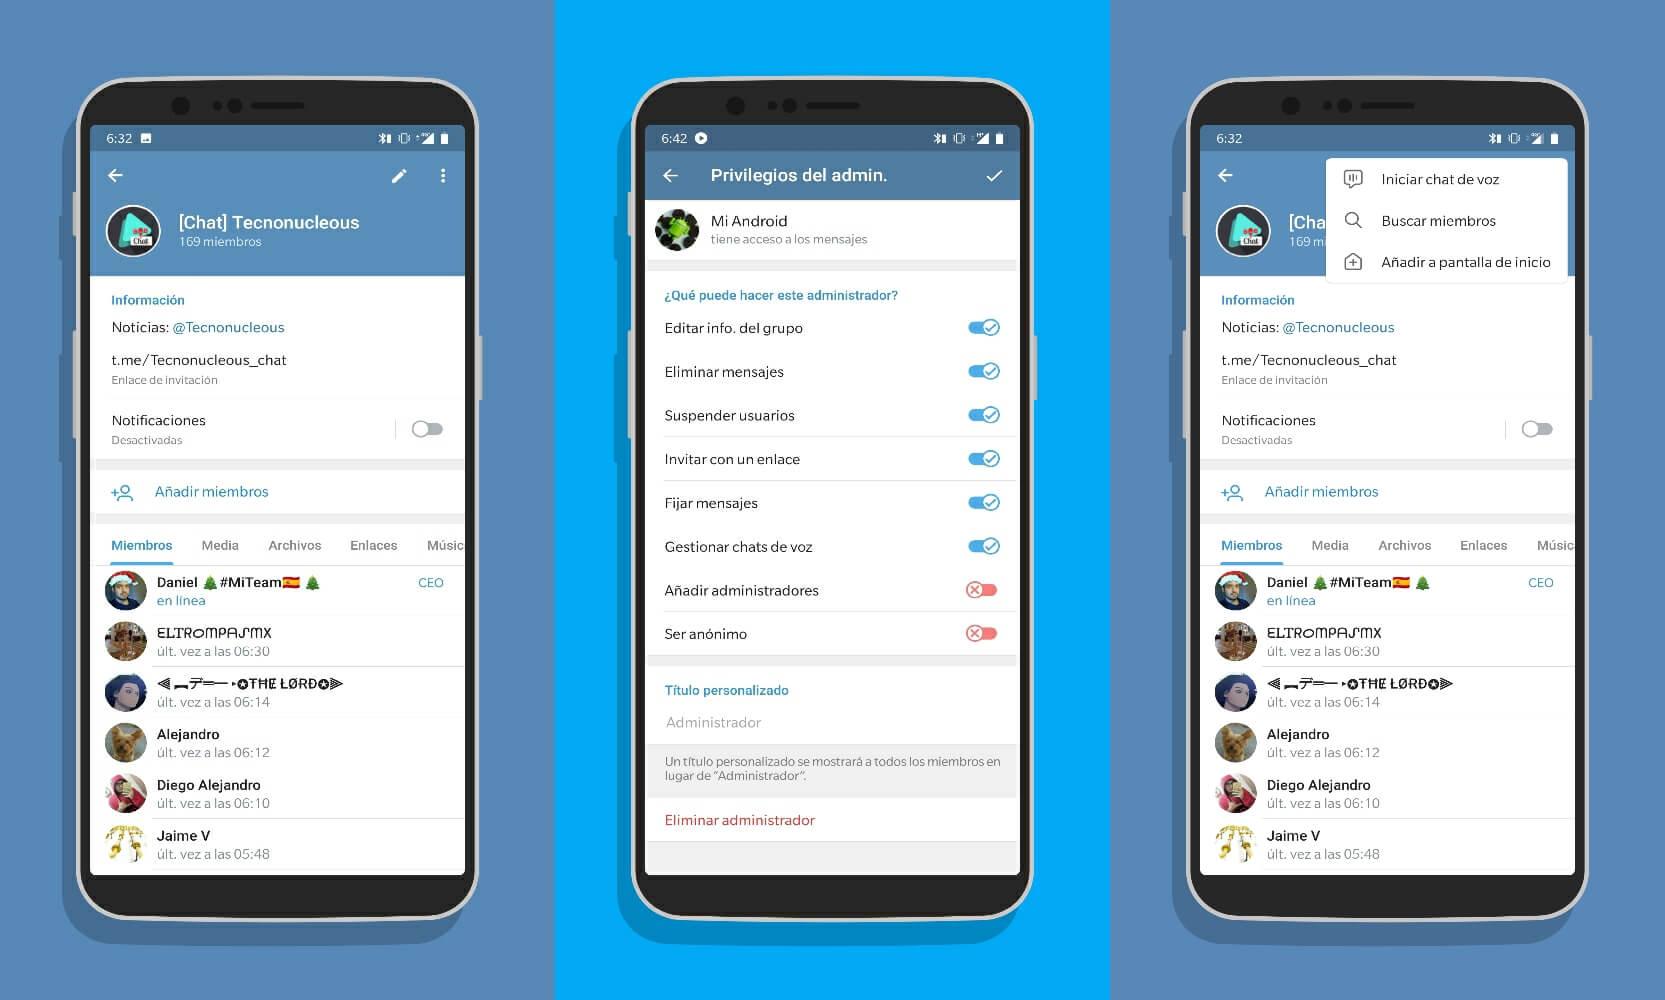 Iniciar chat de voz en Telegram